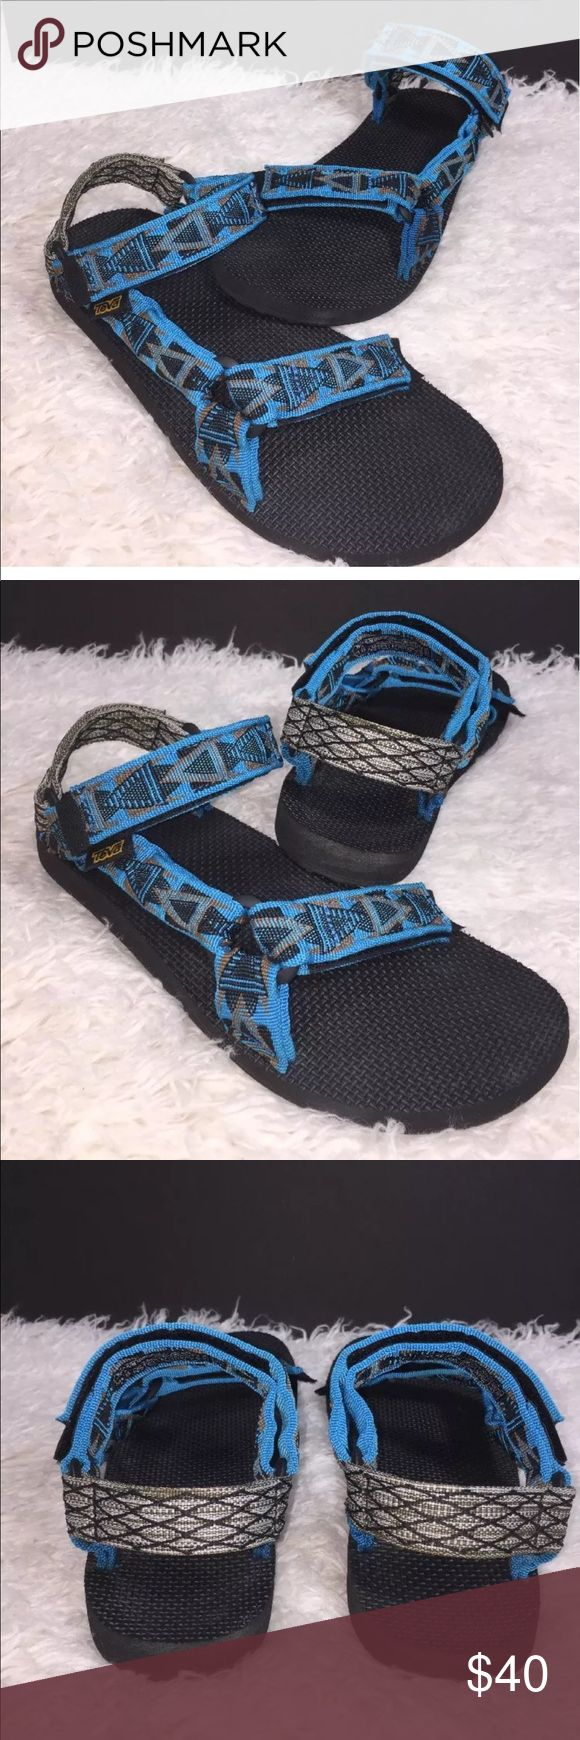 TEVA MEN'S SANDALS ORIGINAL UNIVERSAL Size 9 New TEVA MEN'S SANDALS ORIGINAL UNIVERSAL Size 9 Teva Shoes Sandals & Flip-Flops